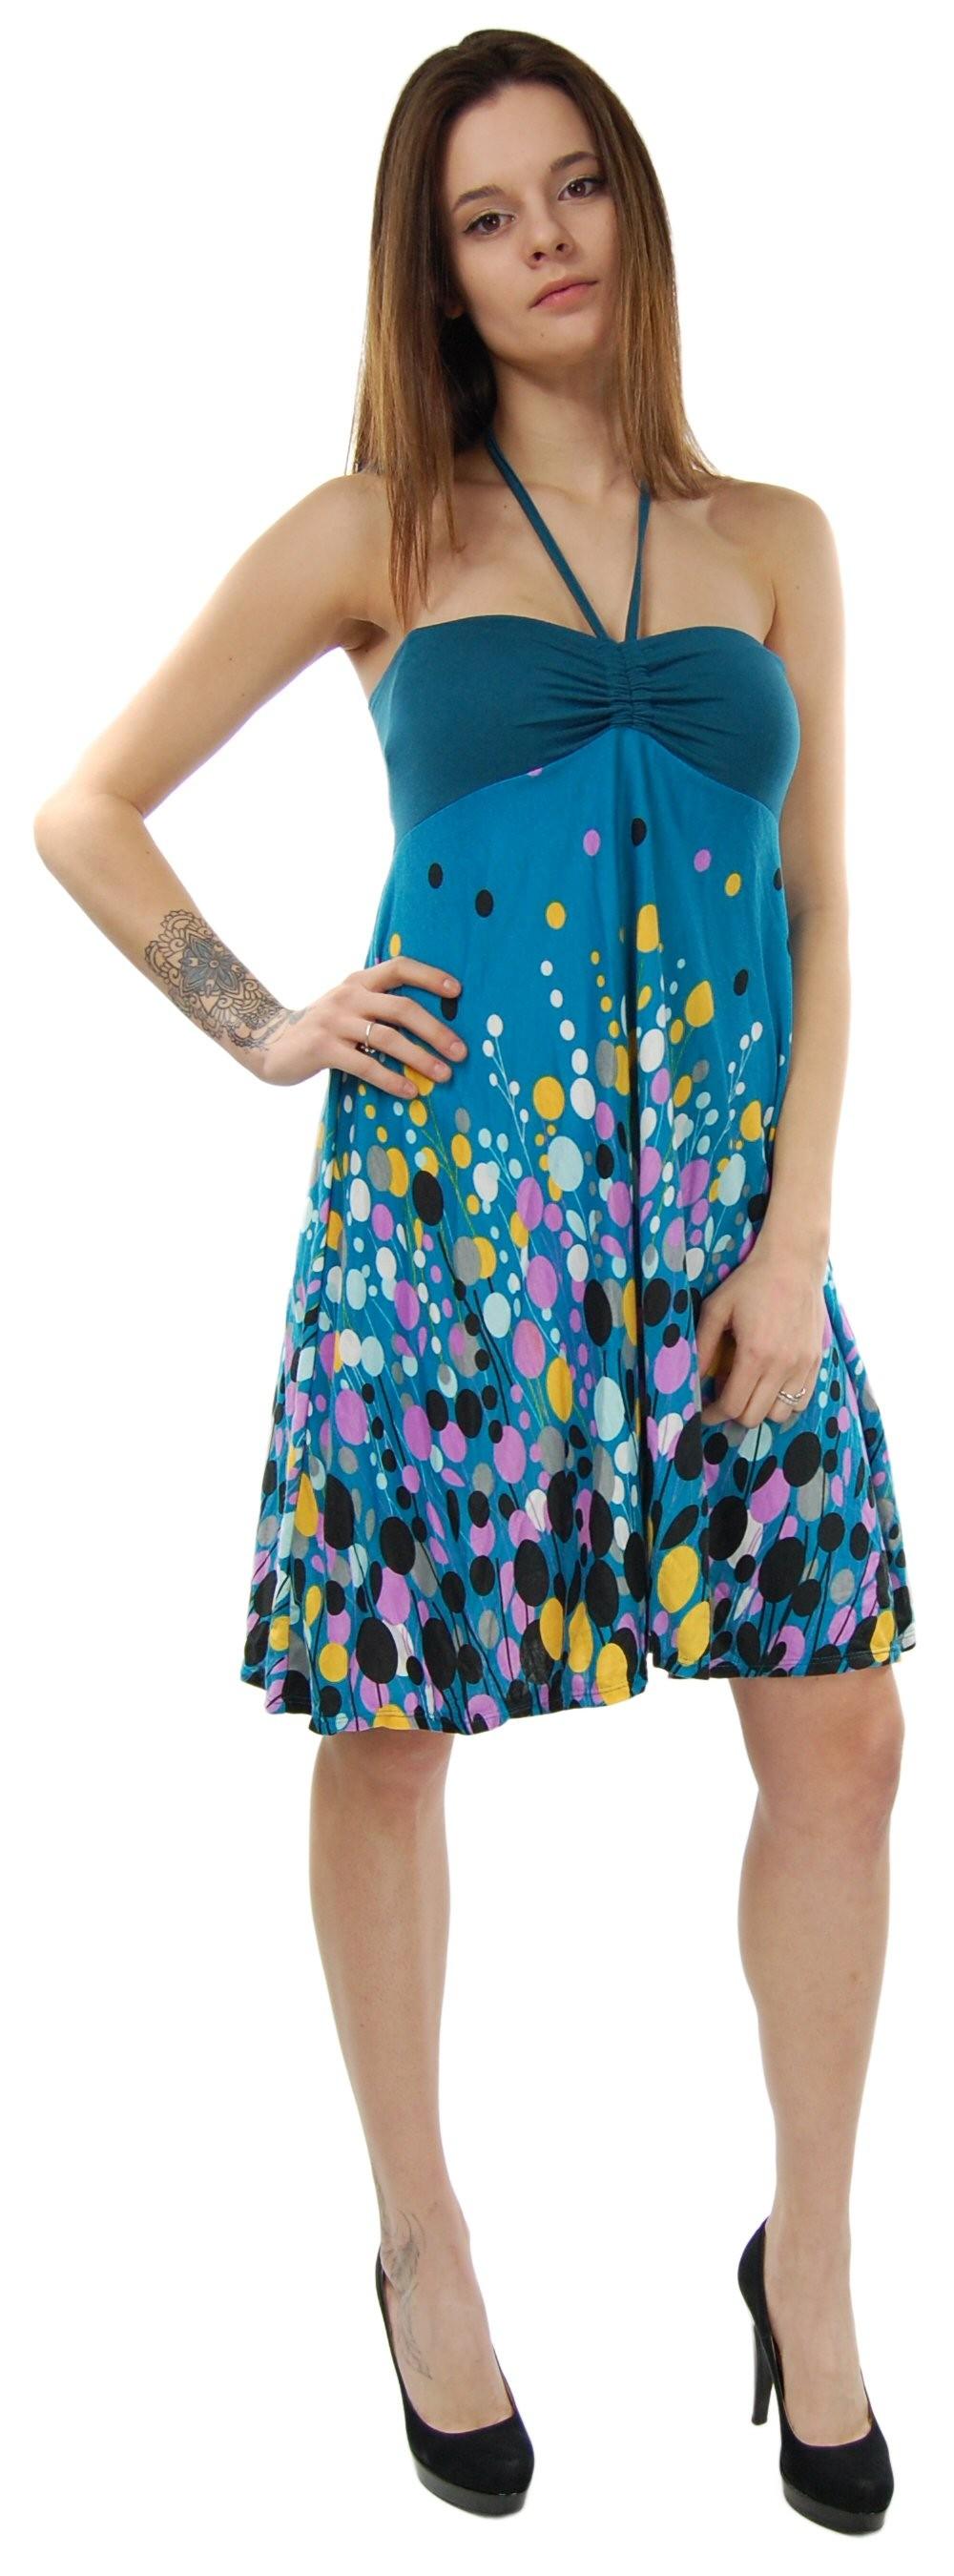 SUMMER SLEEVELESS JERSEY DRESSES AB-MRS059-F3 - Oriente Import S.r.l.